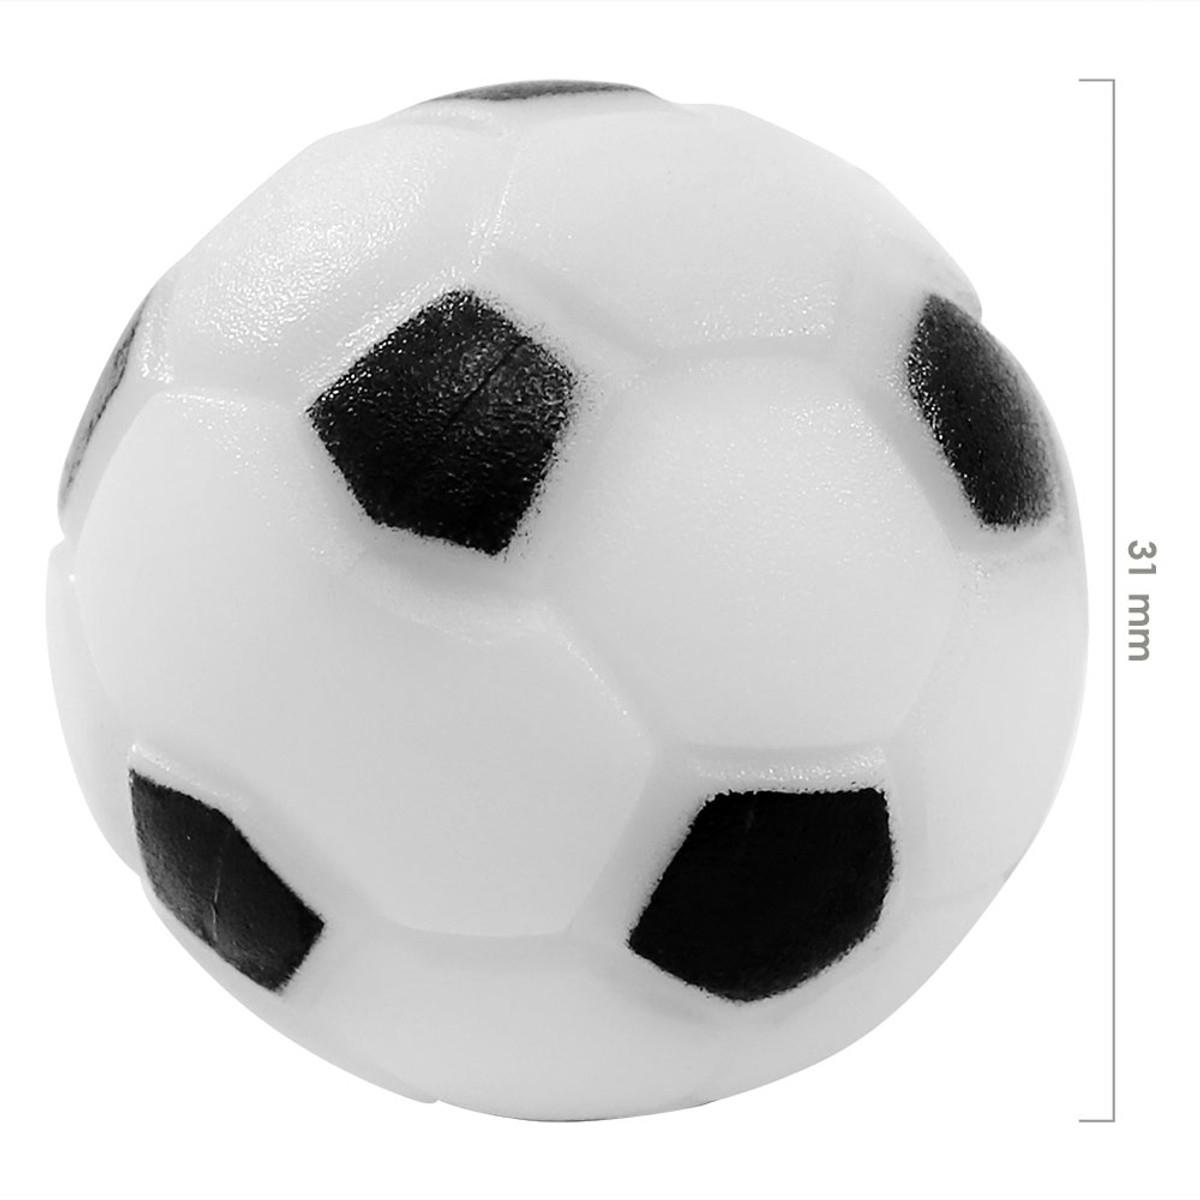 Sunnydaze 36mm Replacement Foosball Table Balls Standard Size